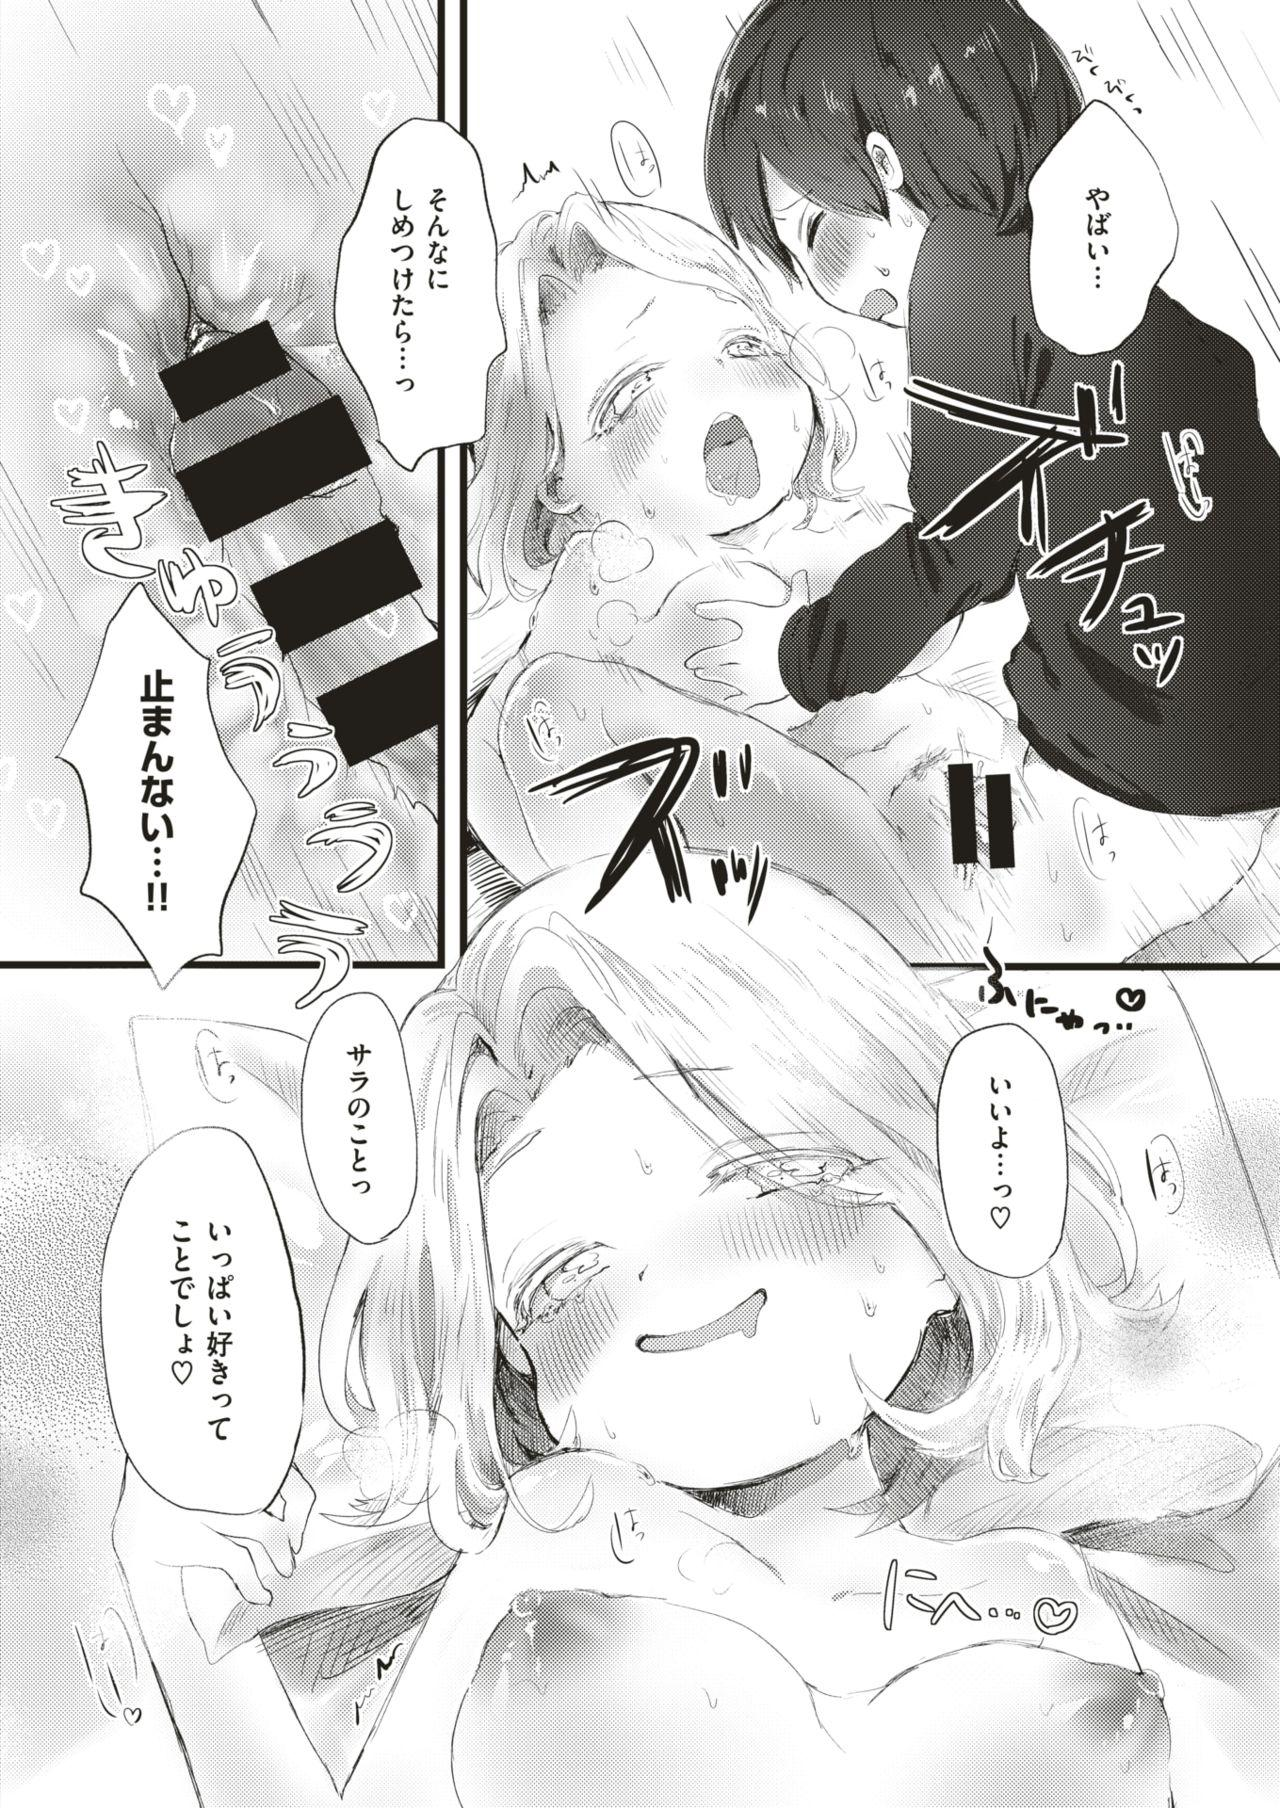 COMIC HAPPINING Vol. 4 98